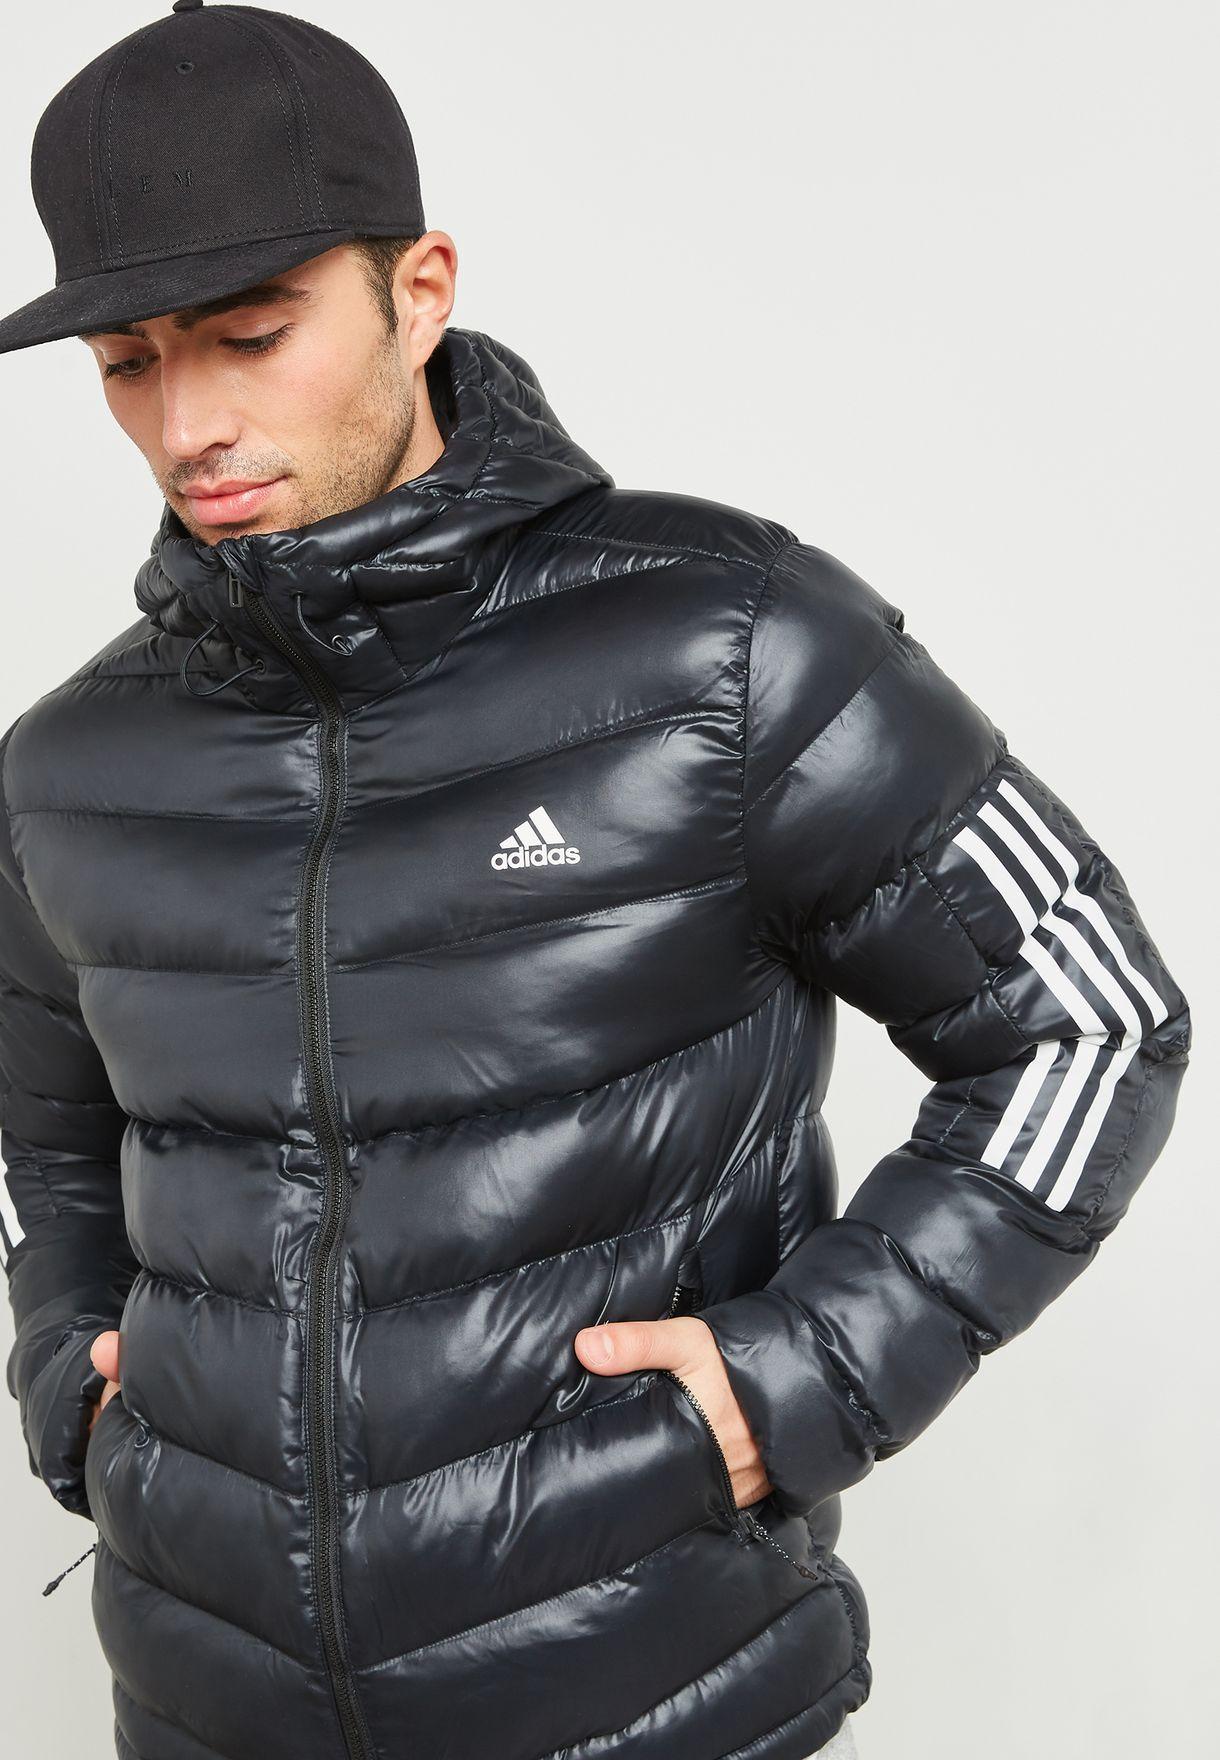 988db12e070c Shop adidas black 3 Stripe Itavic Padded Jacket BQ6800 for Men in UAE -  AD476AT90PRD